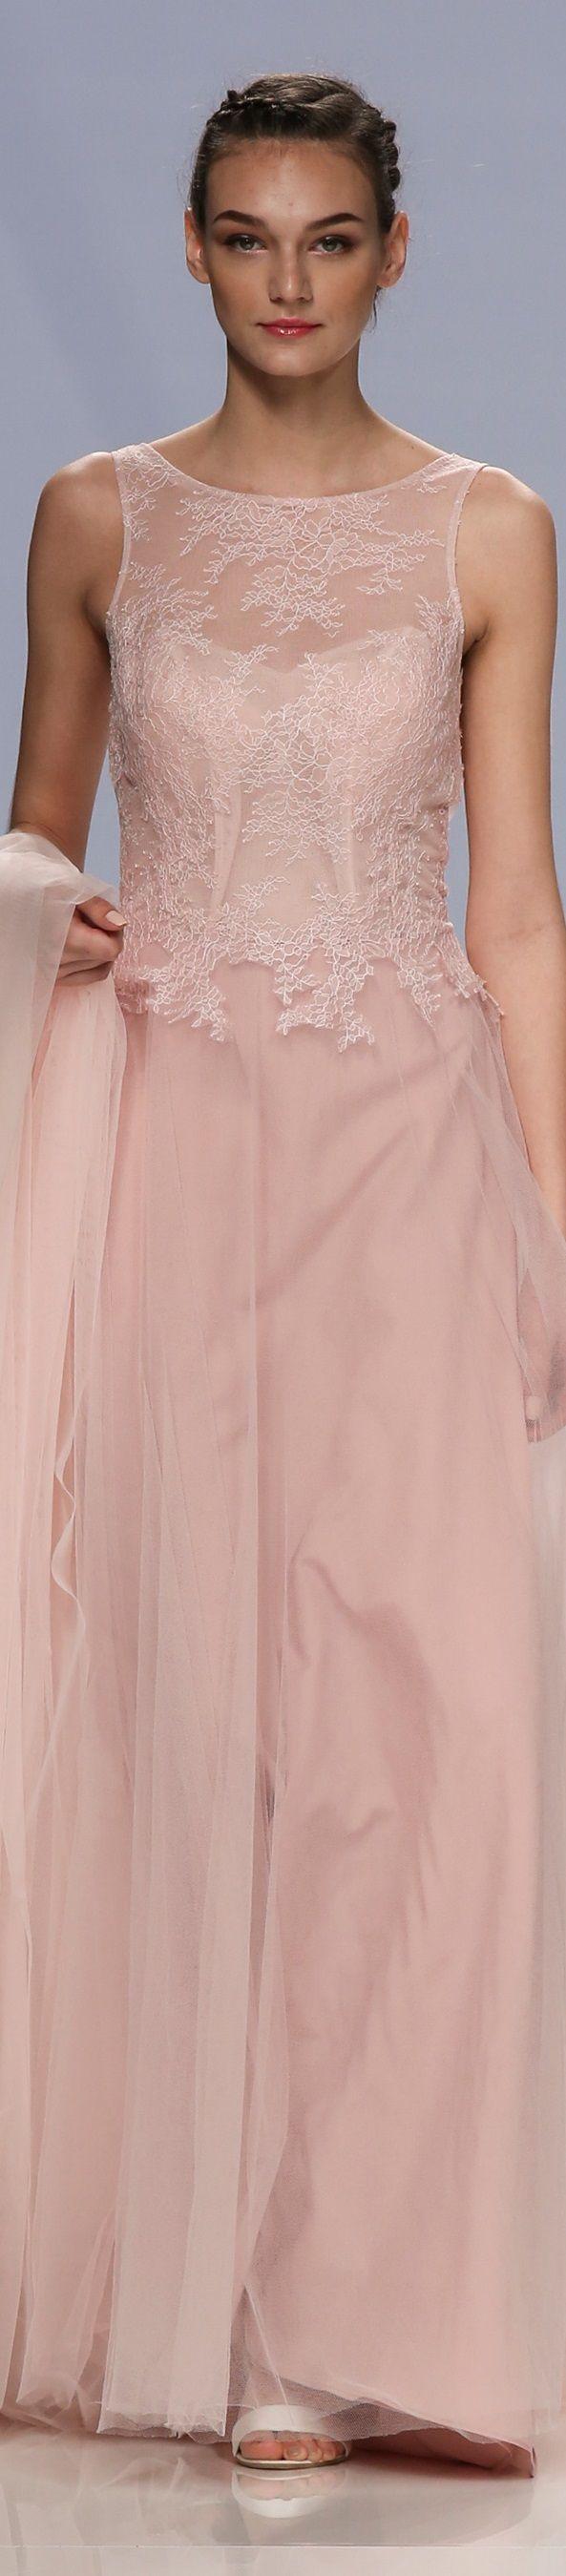 Mejores 528 imágenes de PINK BLUSH WEDDING DRESS en Pinterest ...